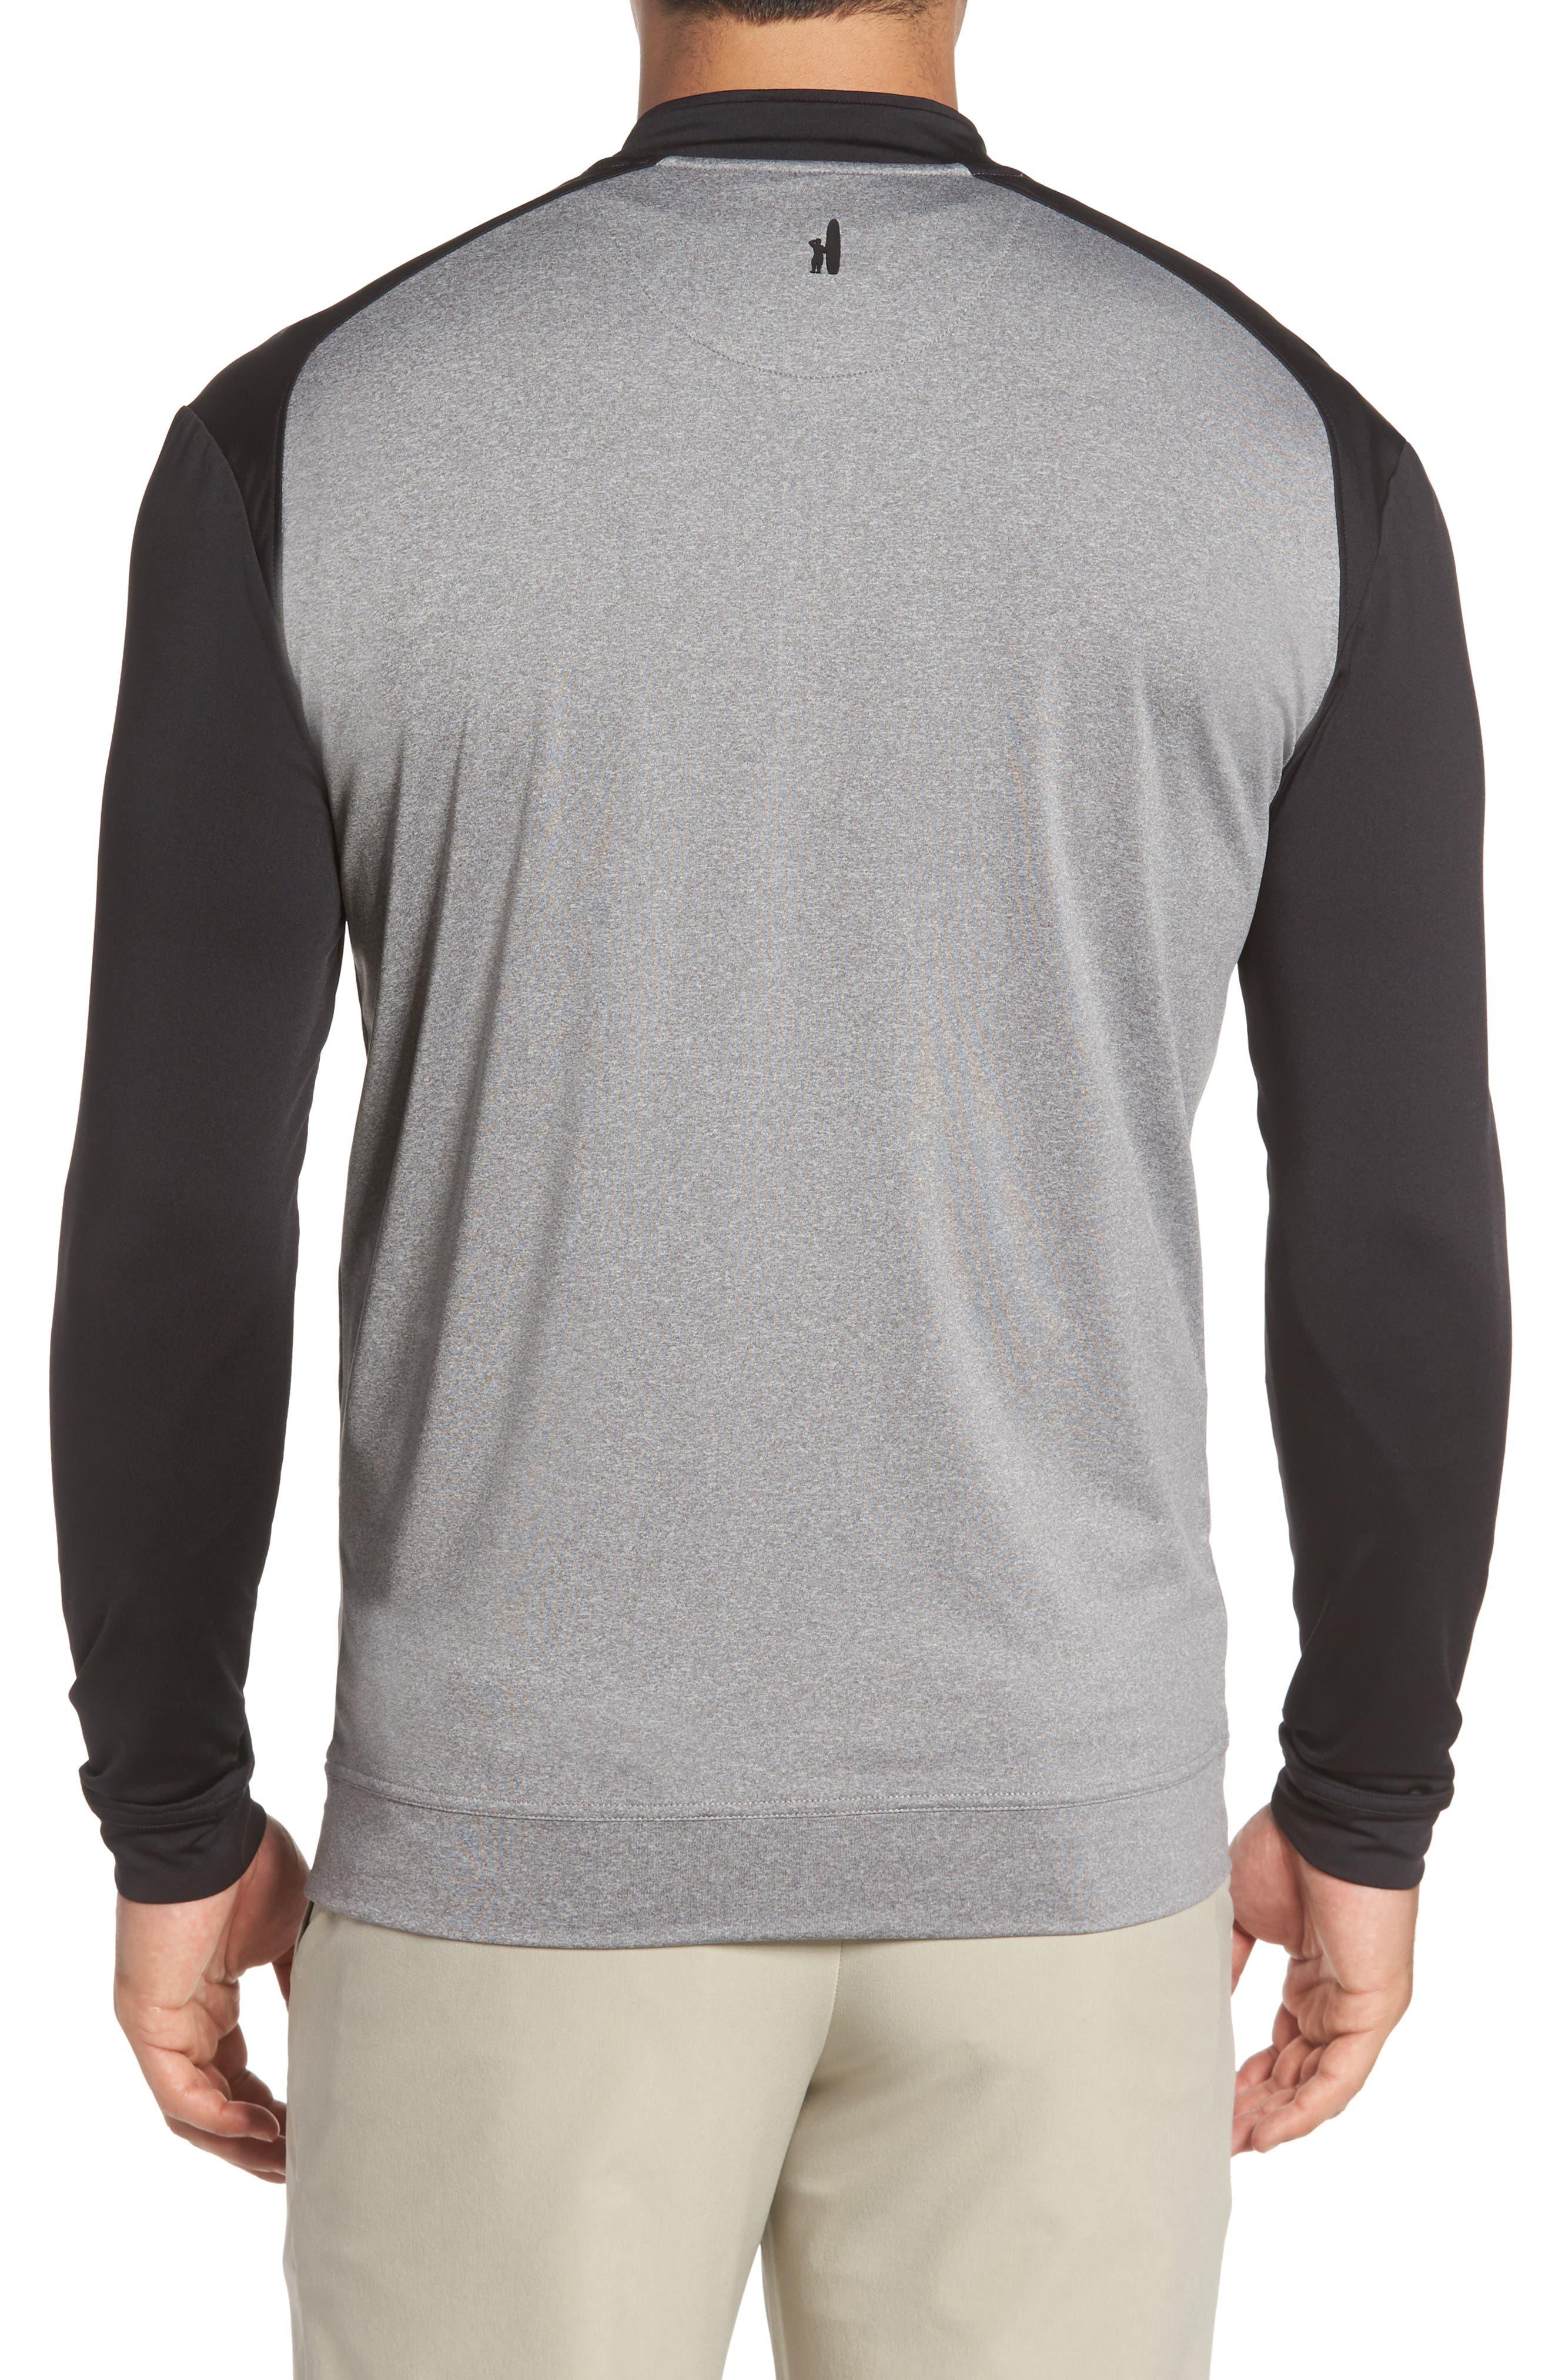 Sway Classic Fit Zip Raglan Pullover,                             Alternate thumbnail 2, color,                             Black